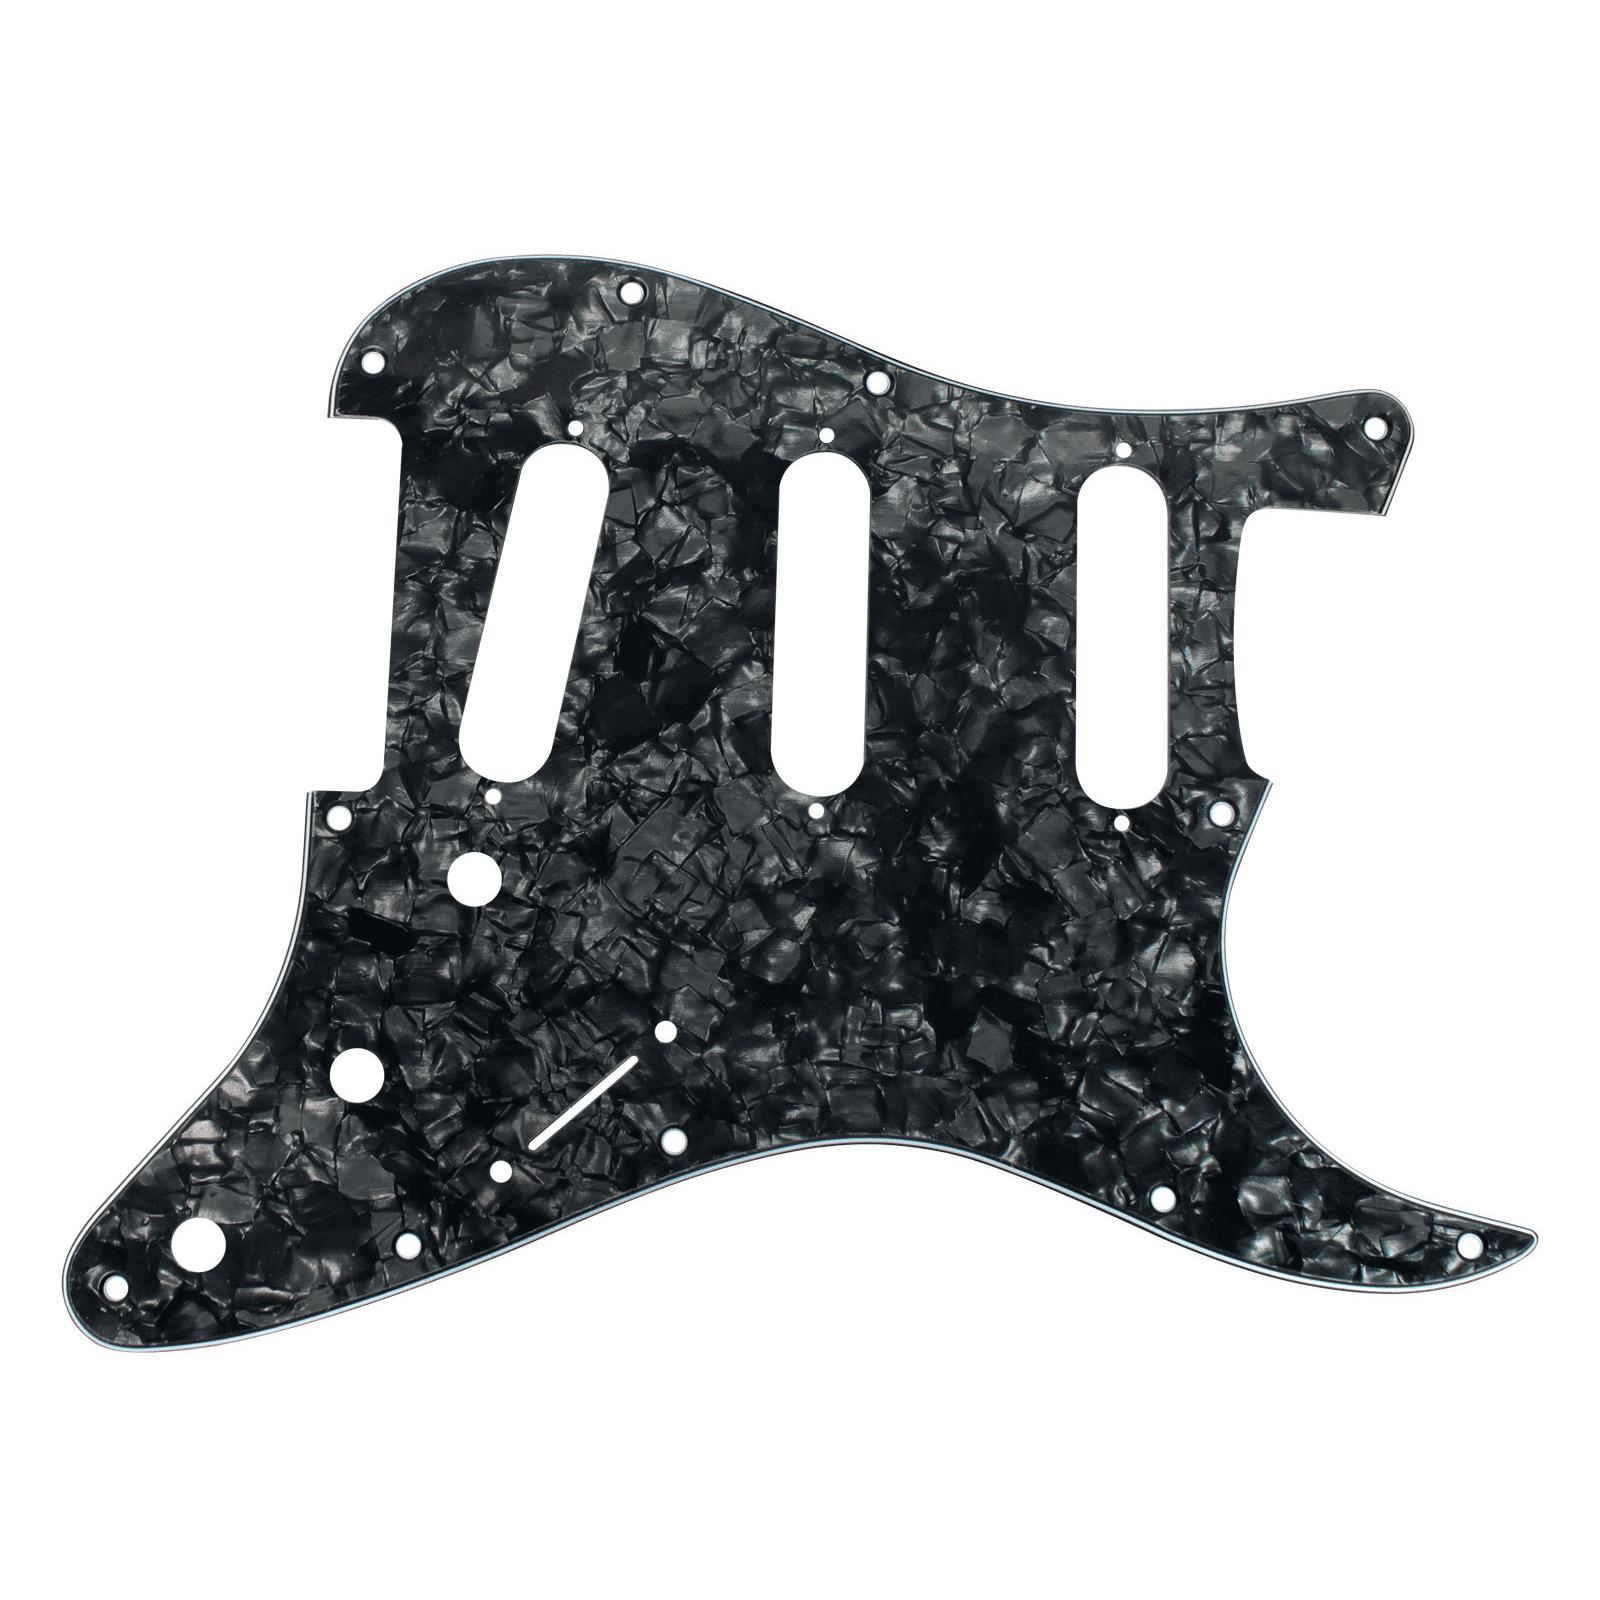 920D CS Black Pearl 3 Ply Pickguard Fender Stratocaster Strat CNC Presicion Cut by